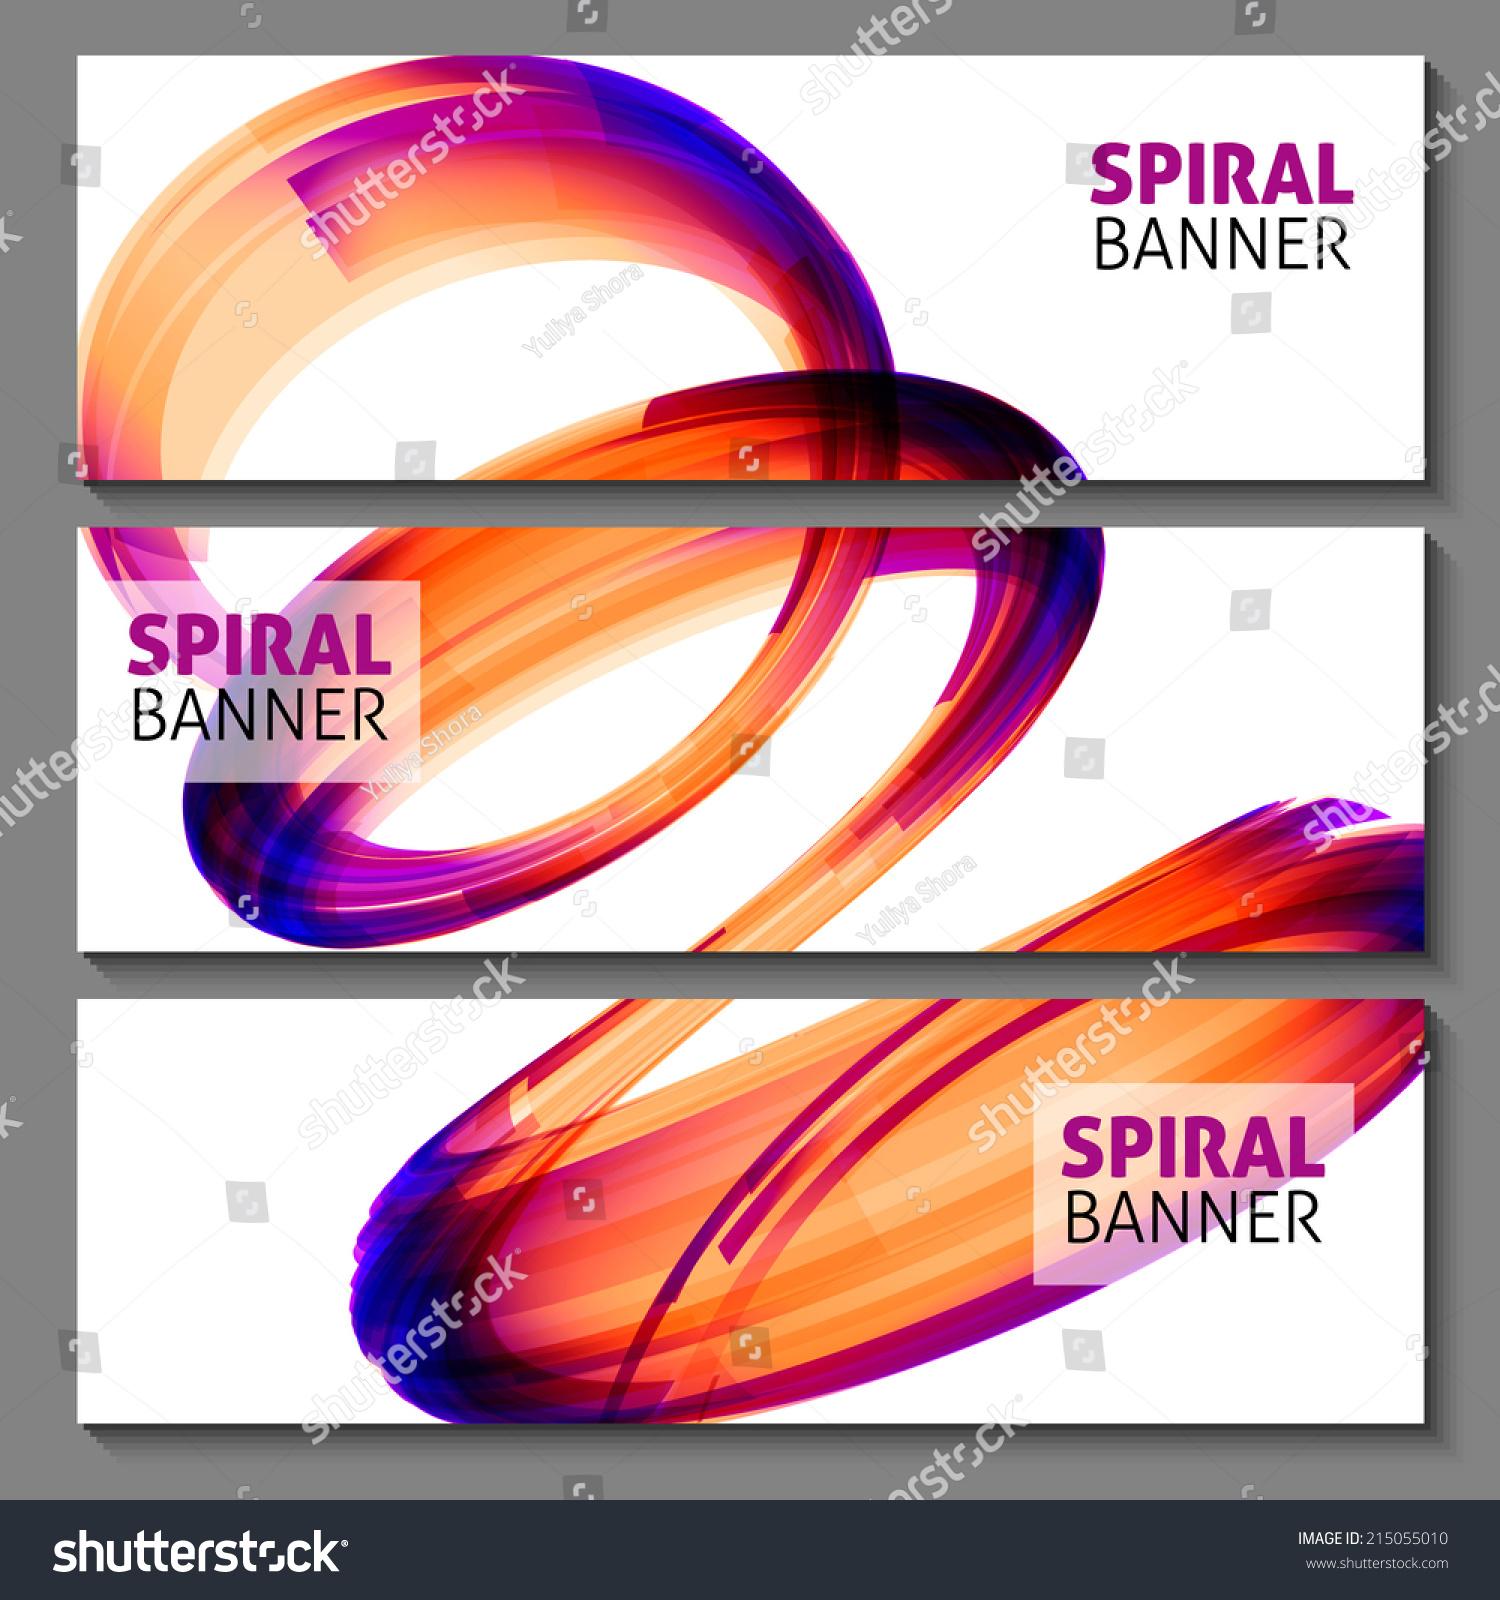 Tornado Banners Eid Fashion Banners